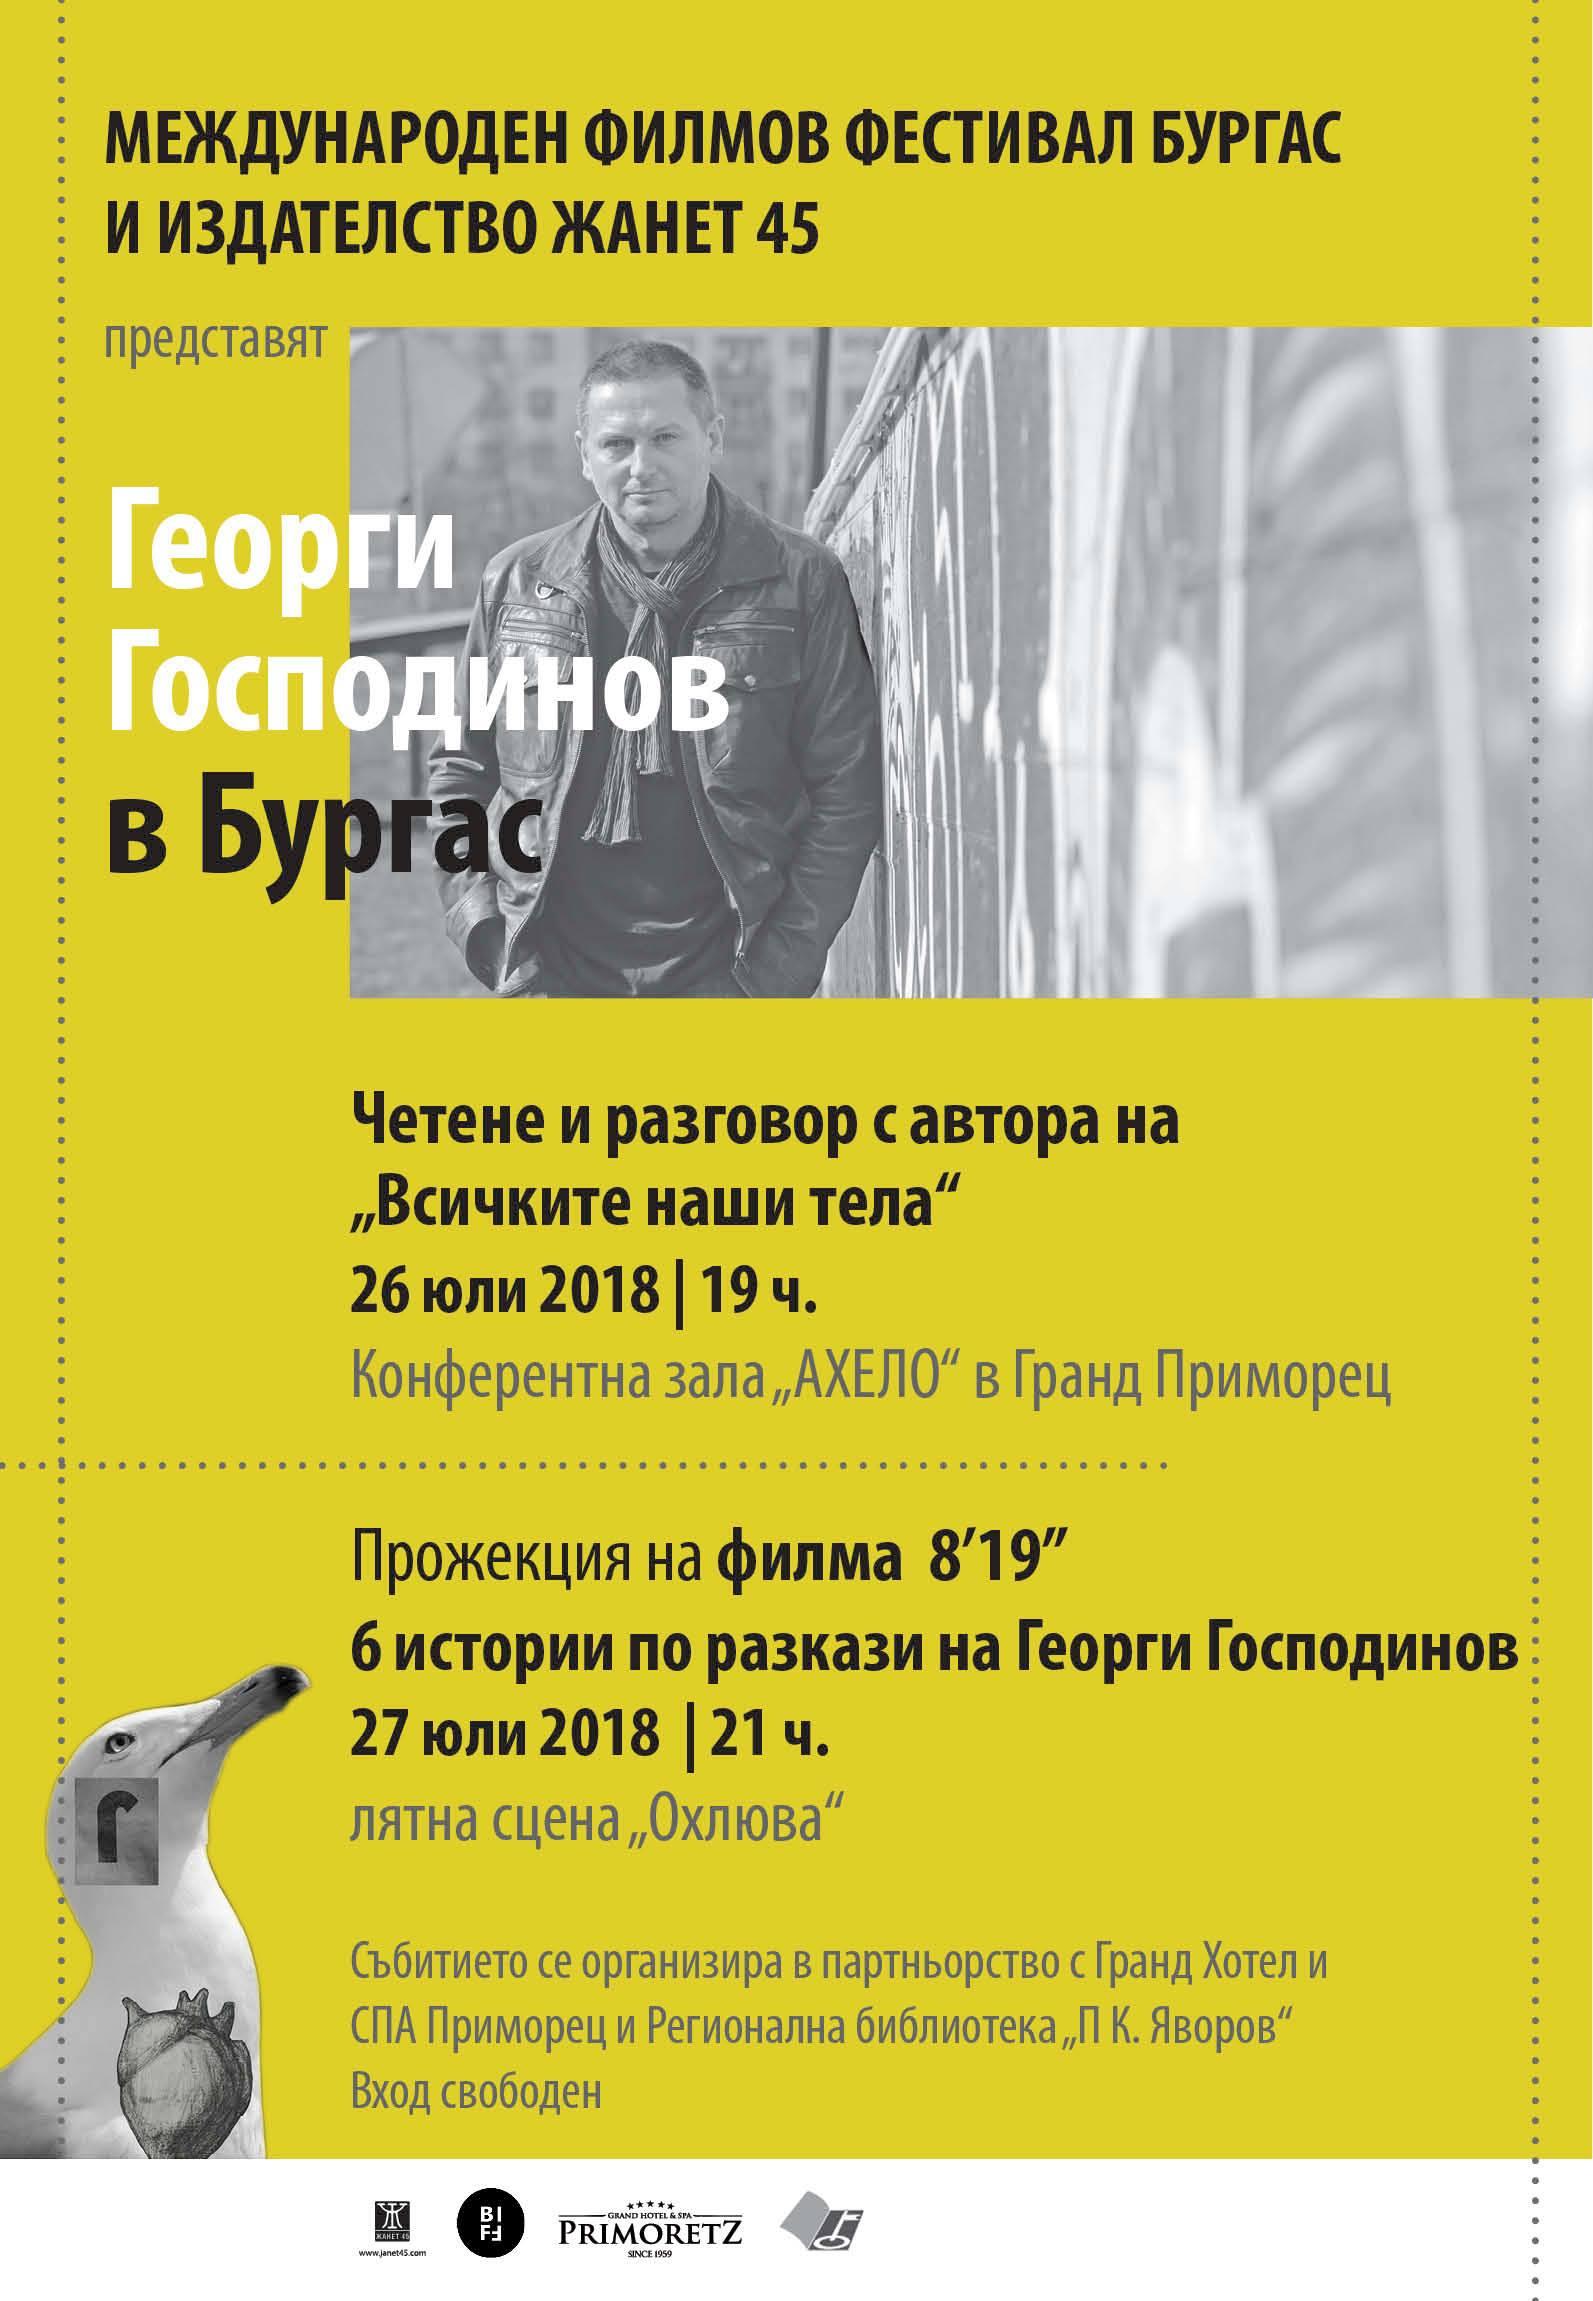 Новата книга на Георги Господинов с премиера в Бургас на 26 юли